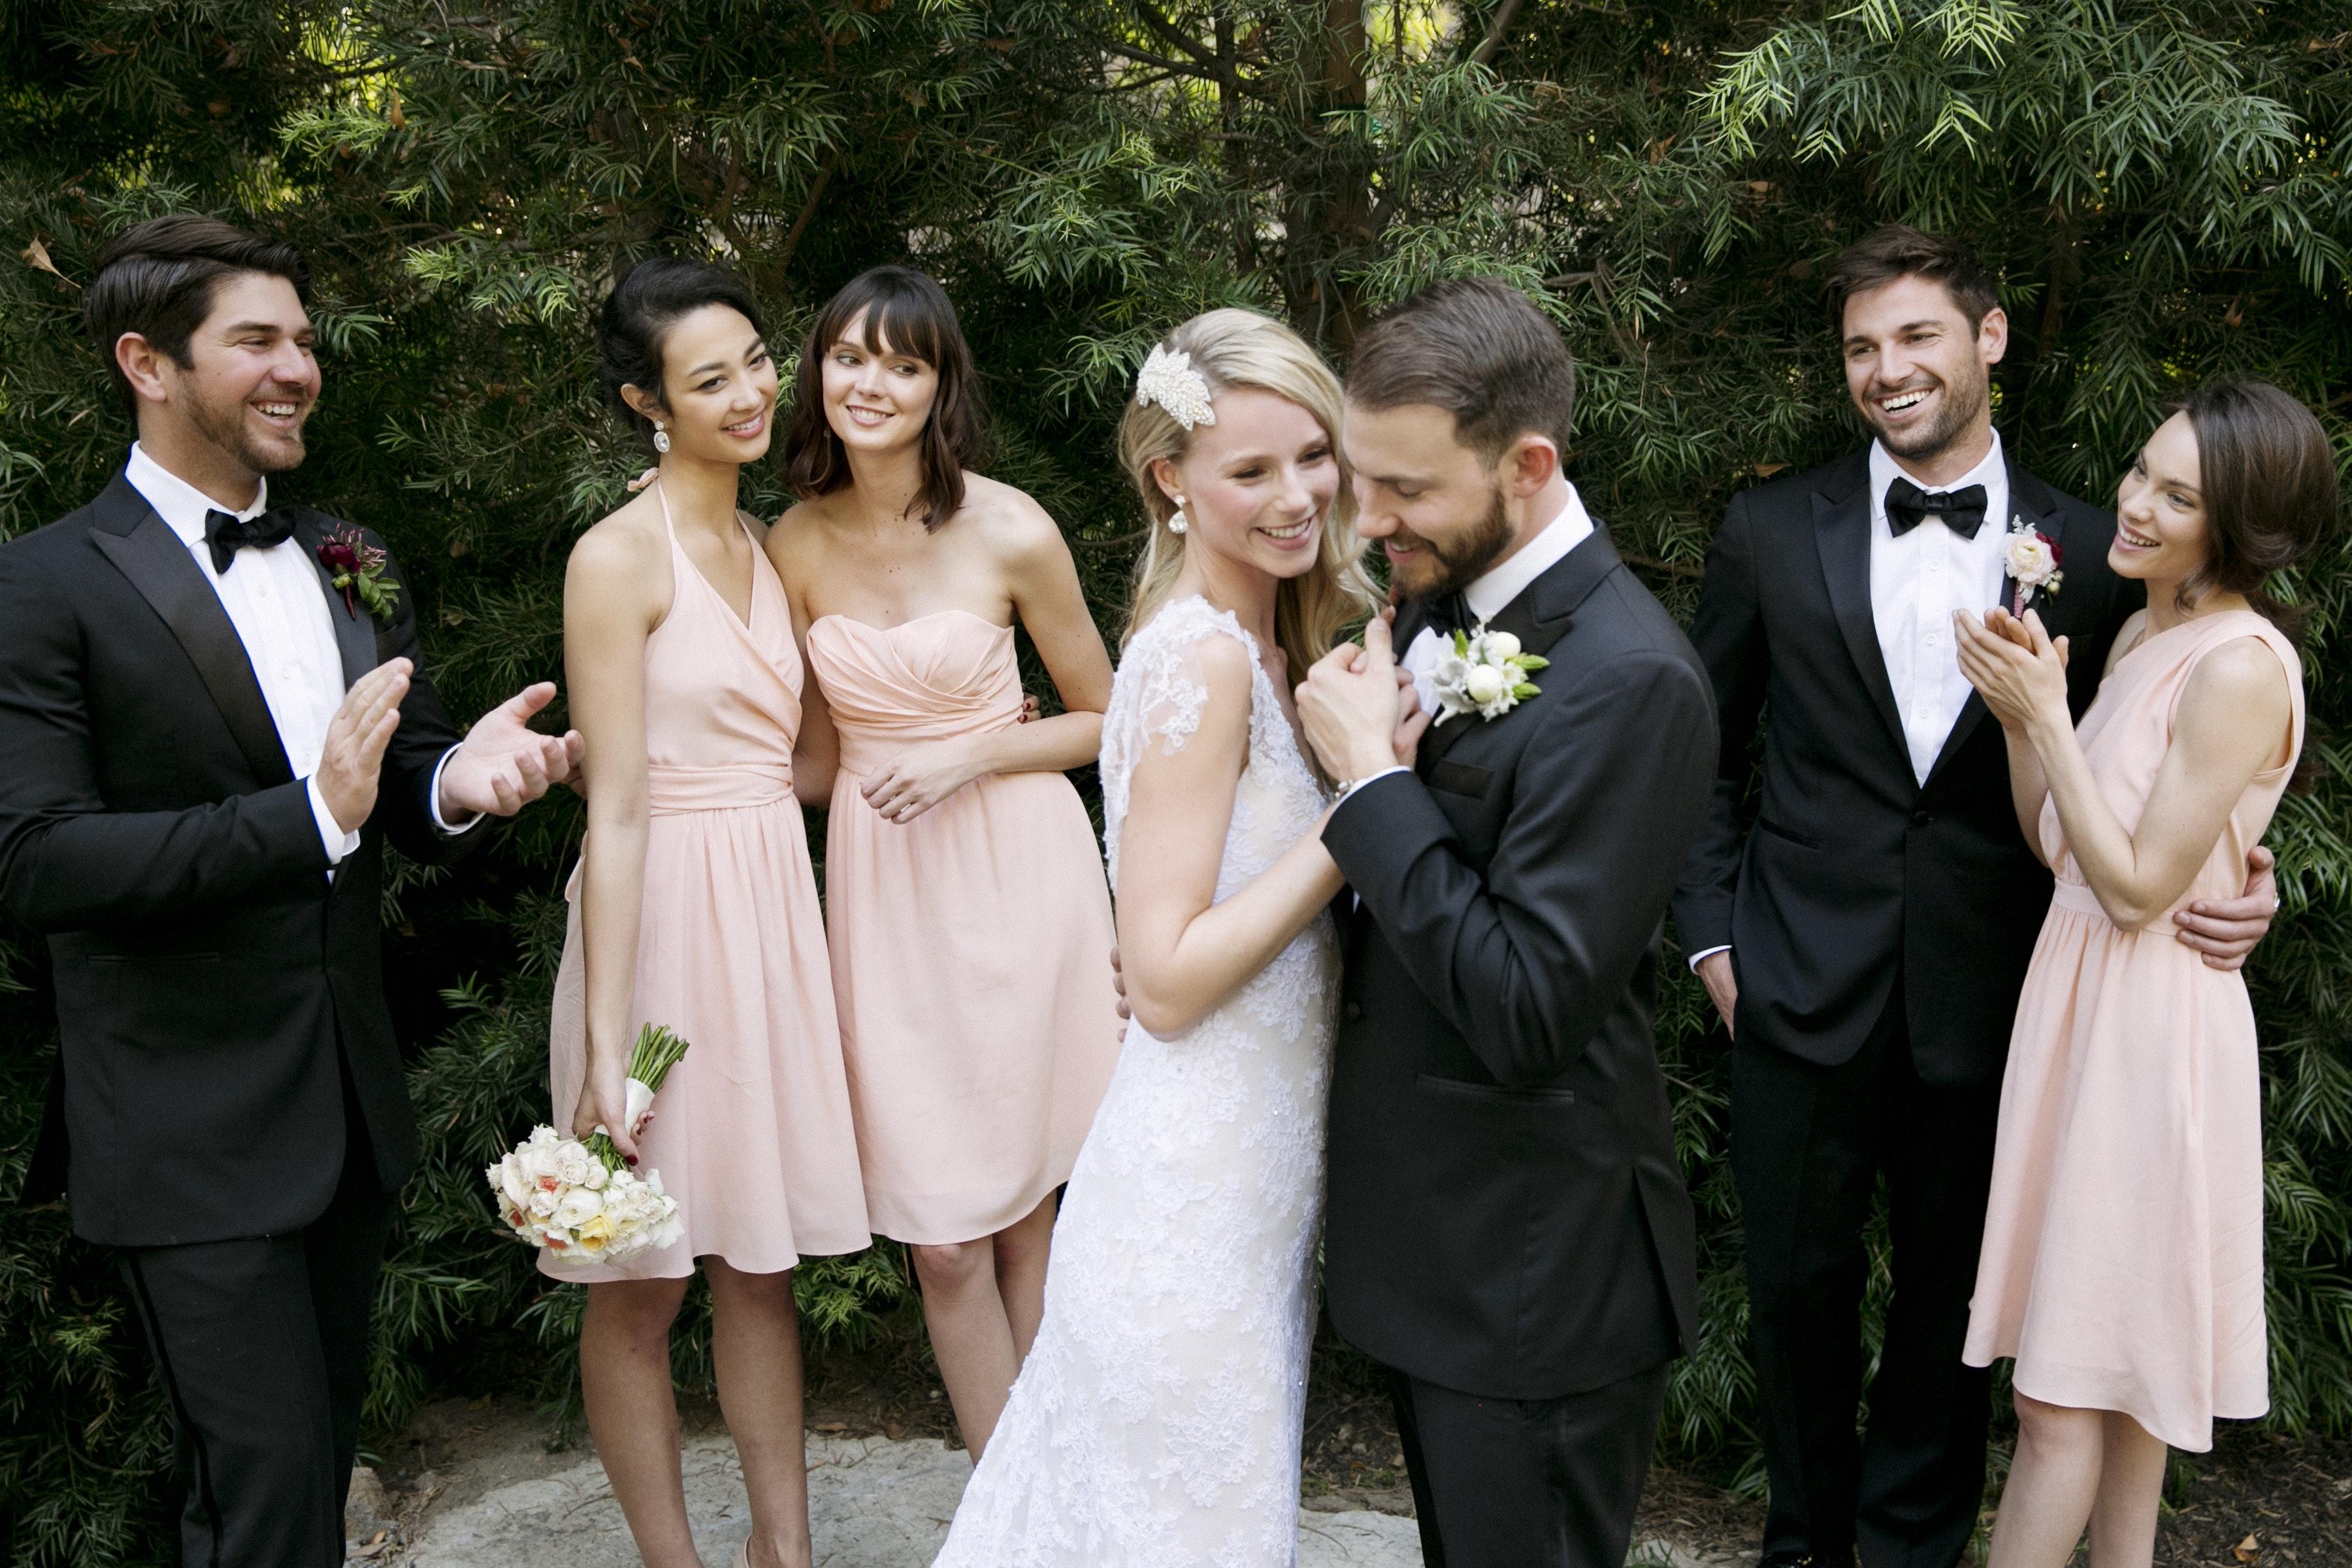 Wedding Bridesmaid Dress Rental rental bridesmaid dresses 2017 dresses